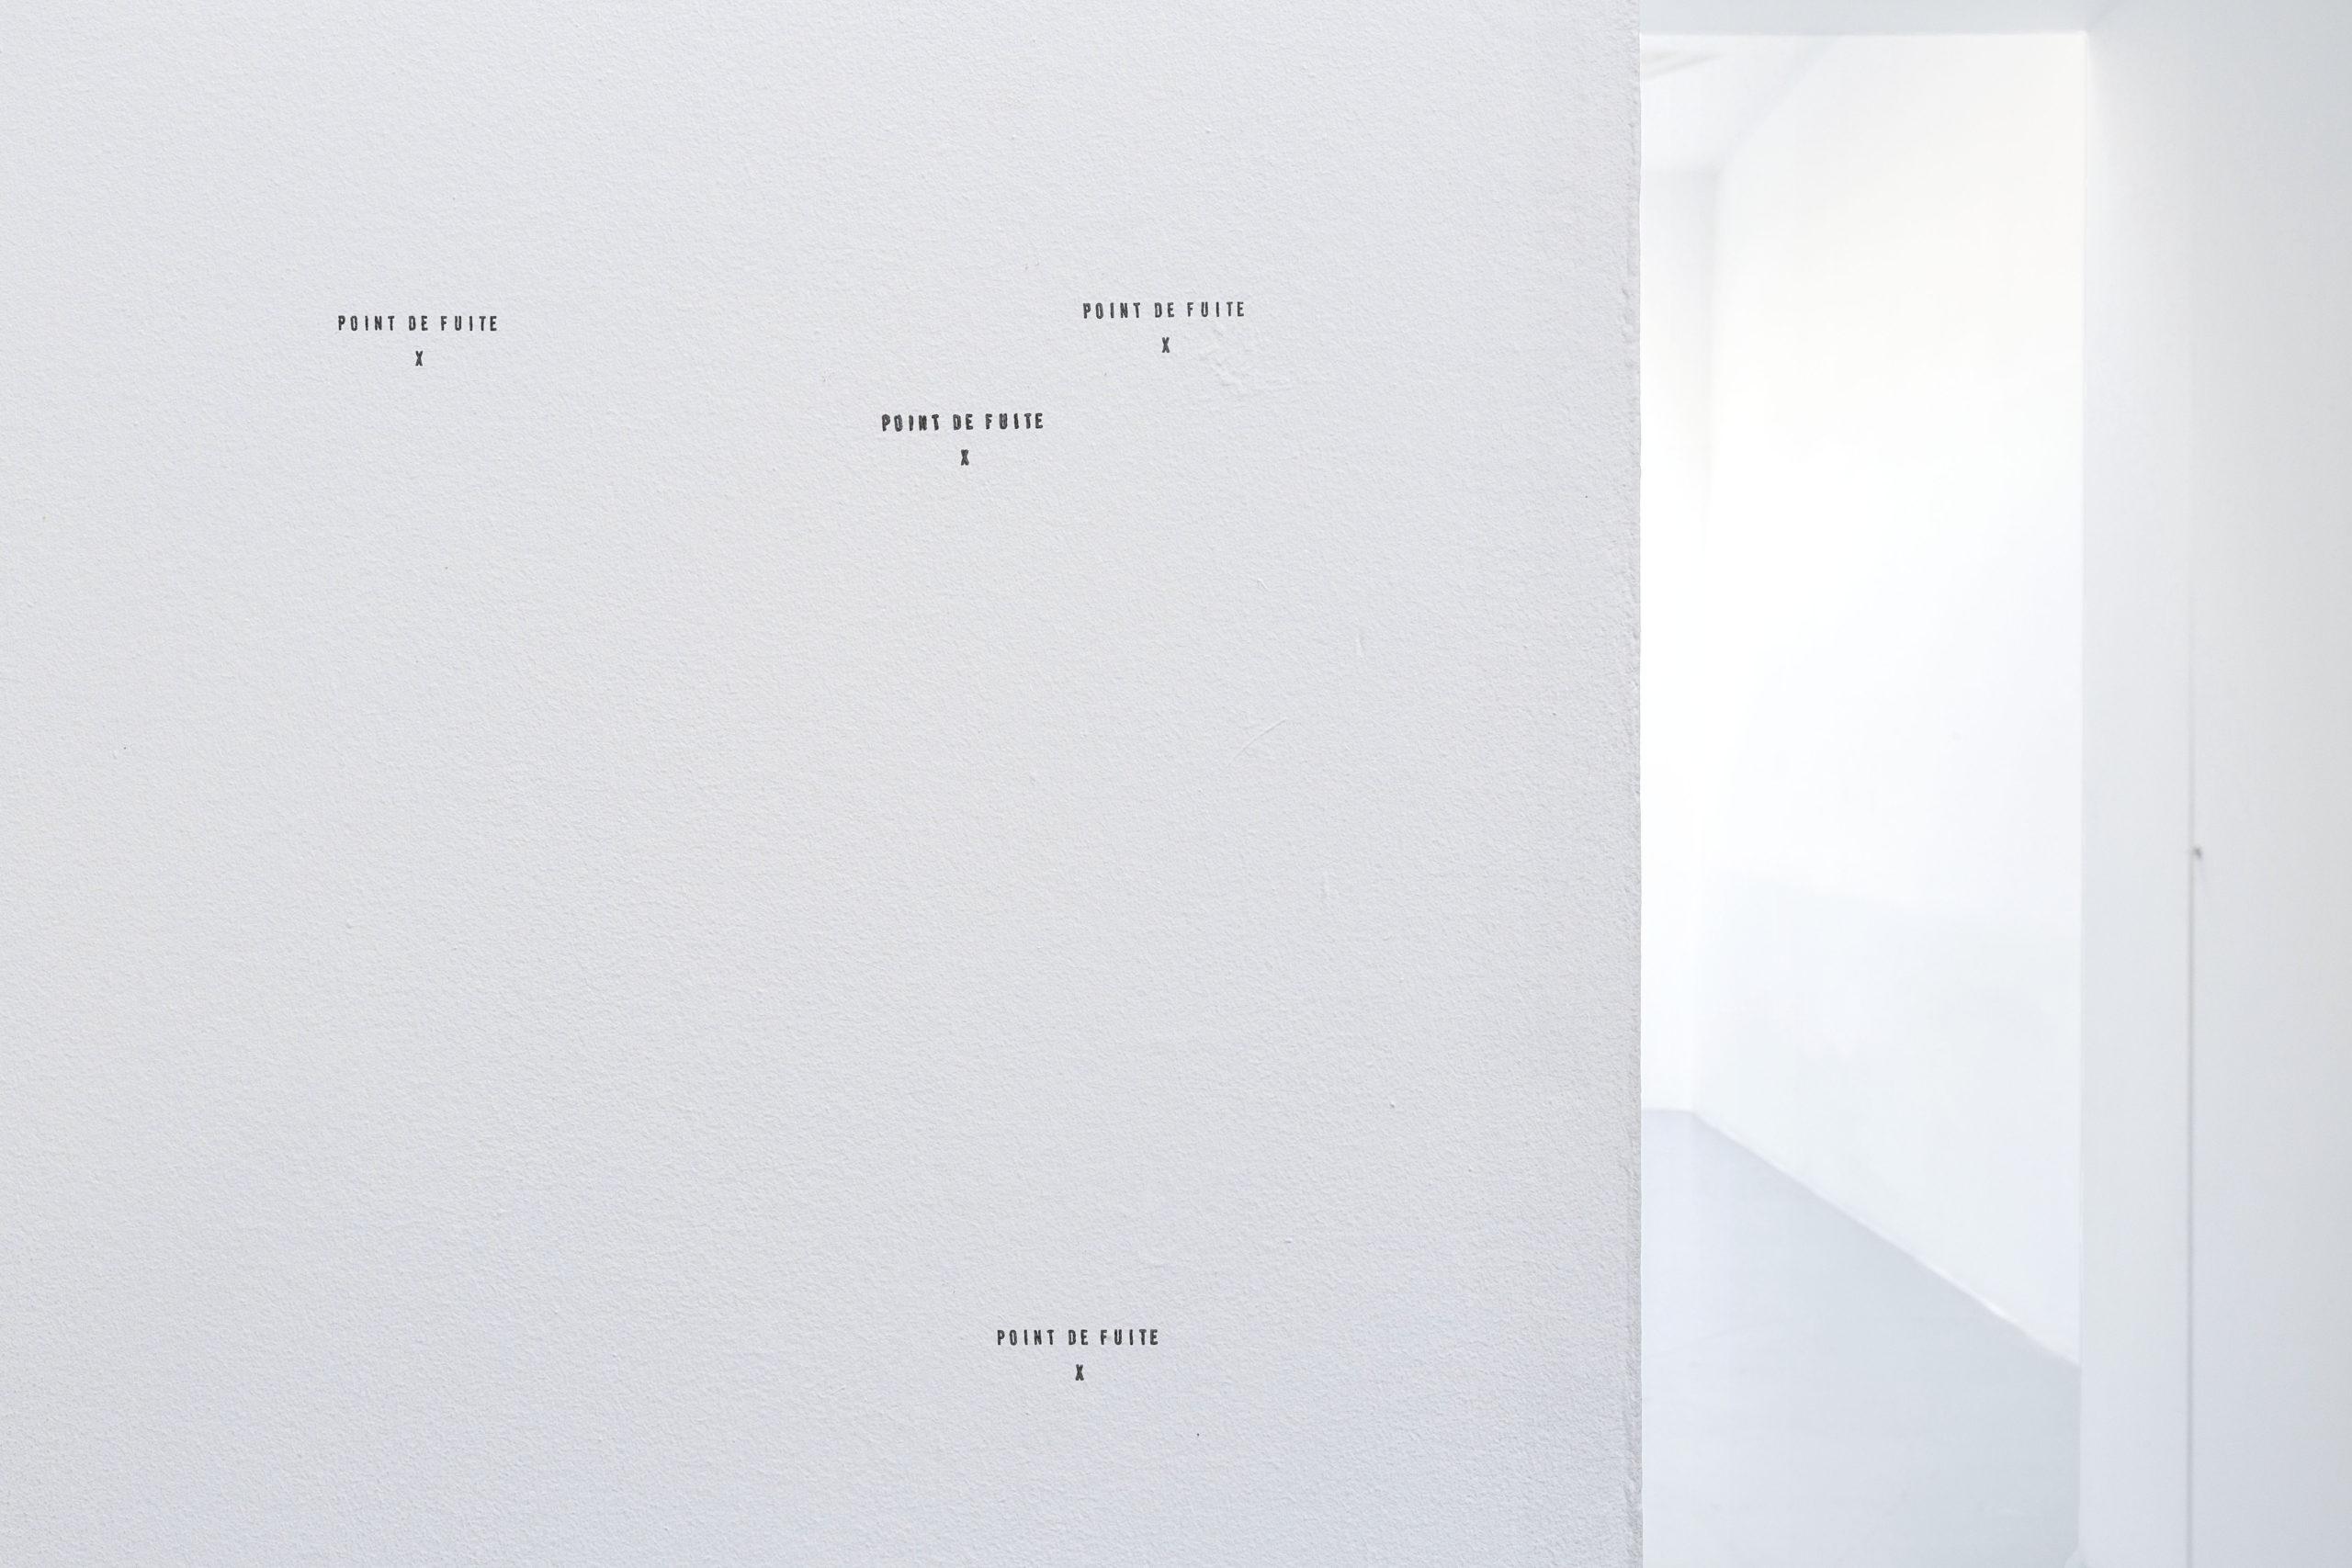 Elsa Werth, Point de fuite, 2017, tampon, encre, dimensions variables © Elsa Werth